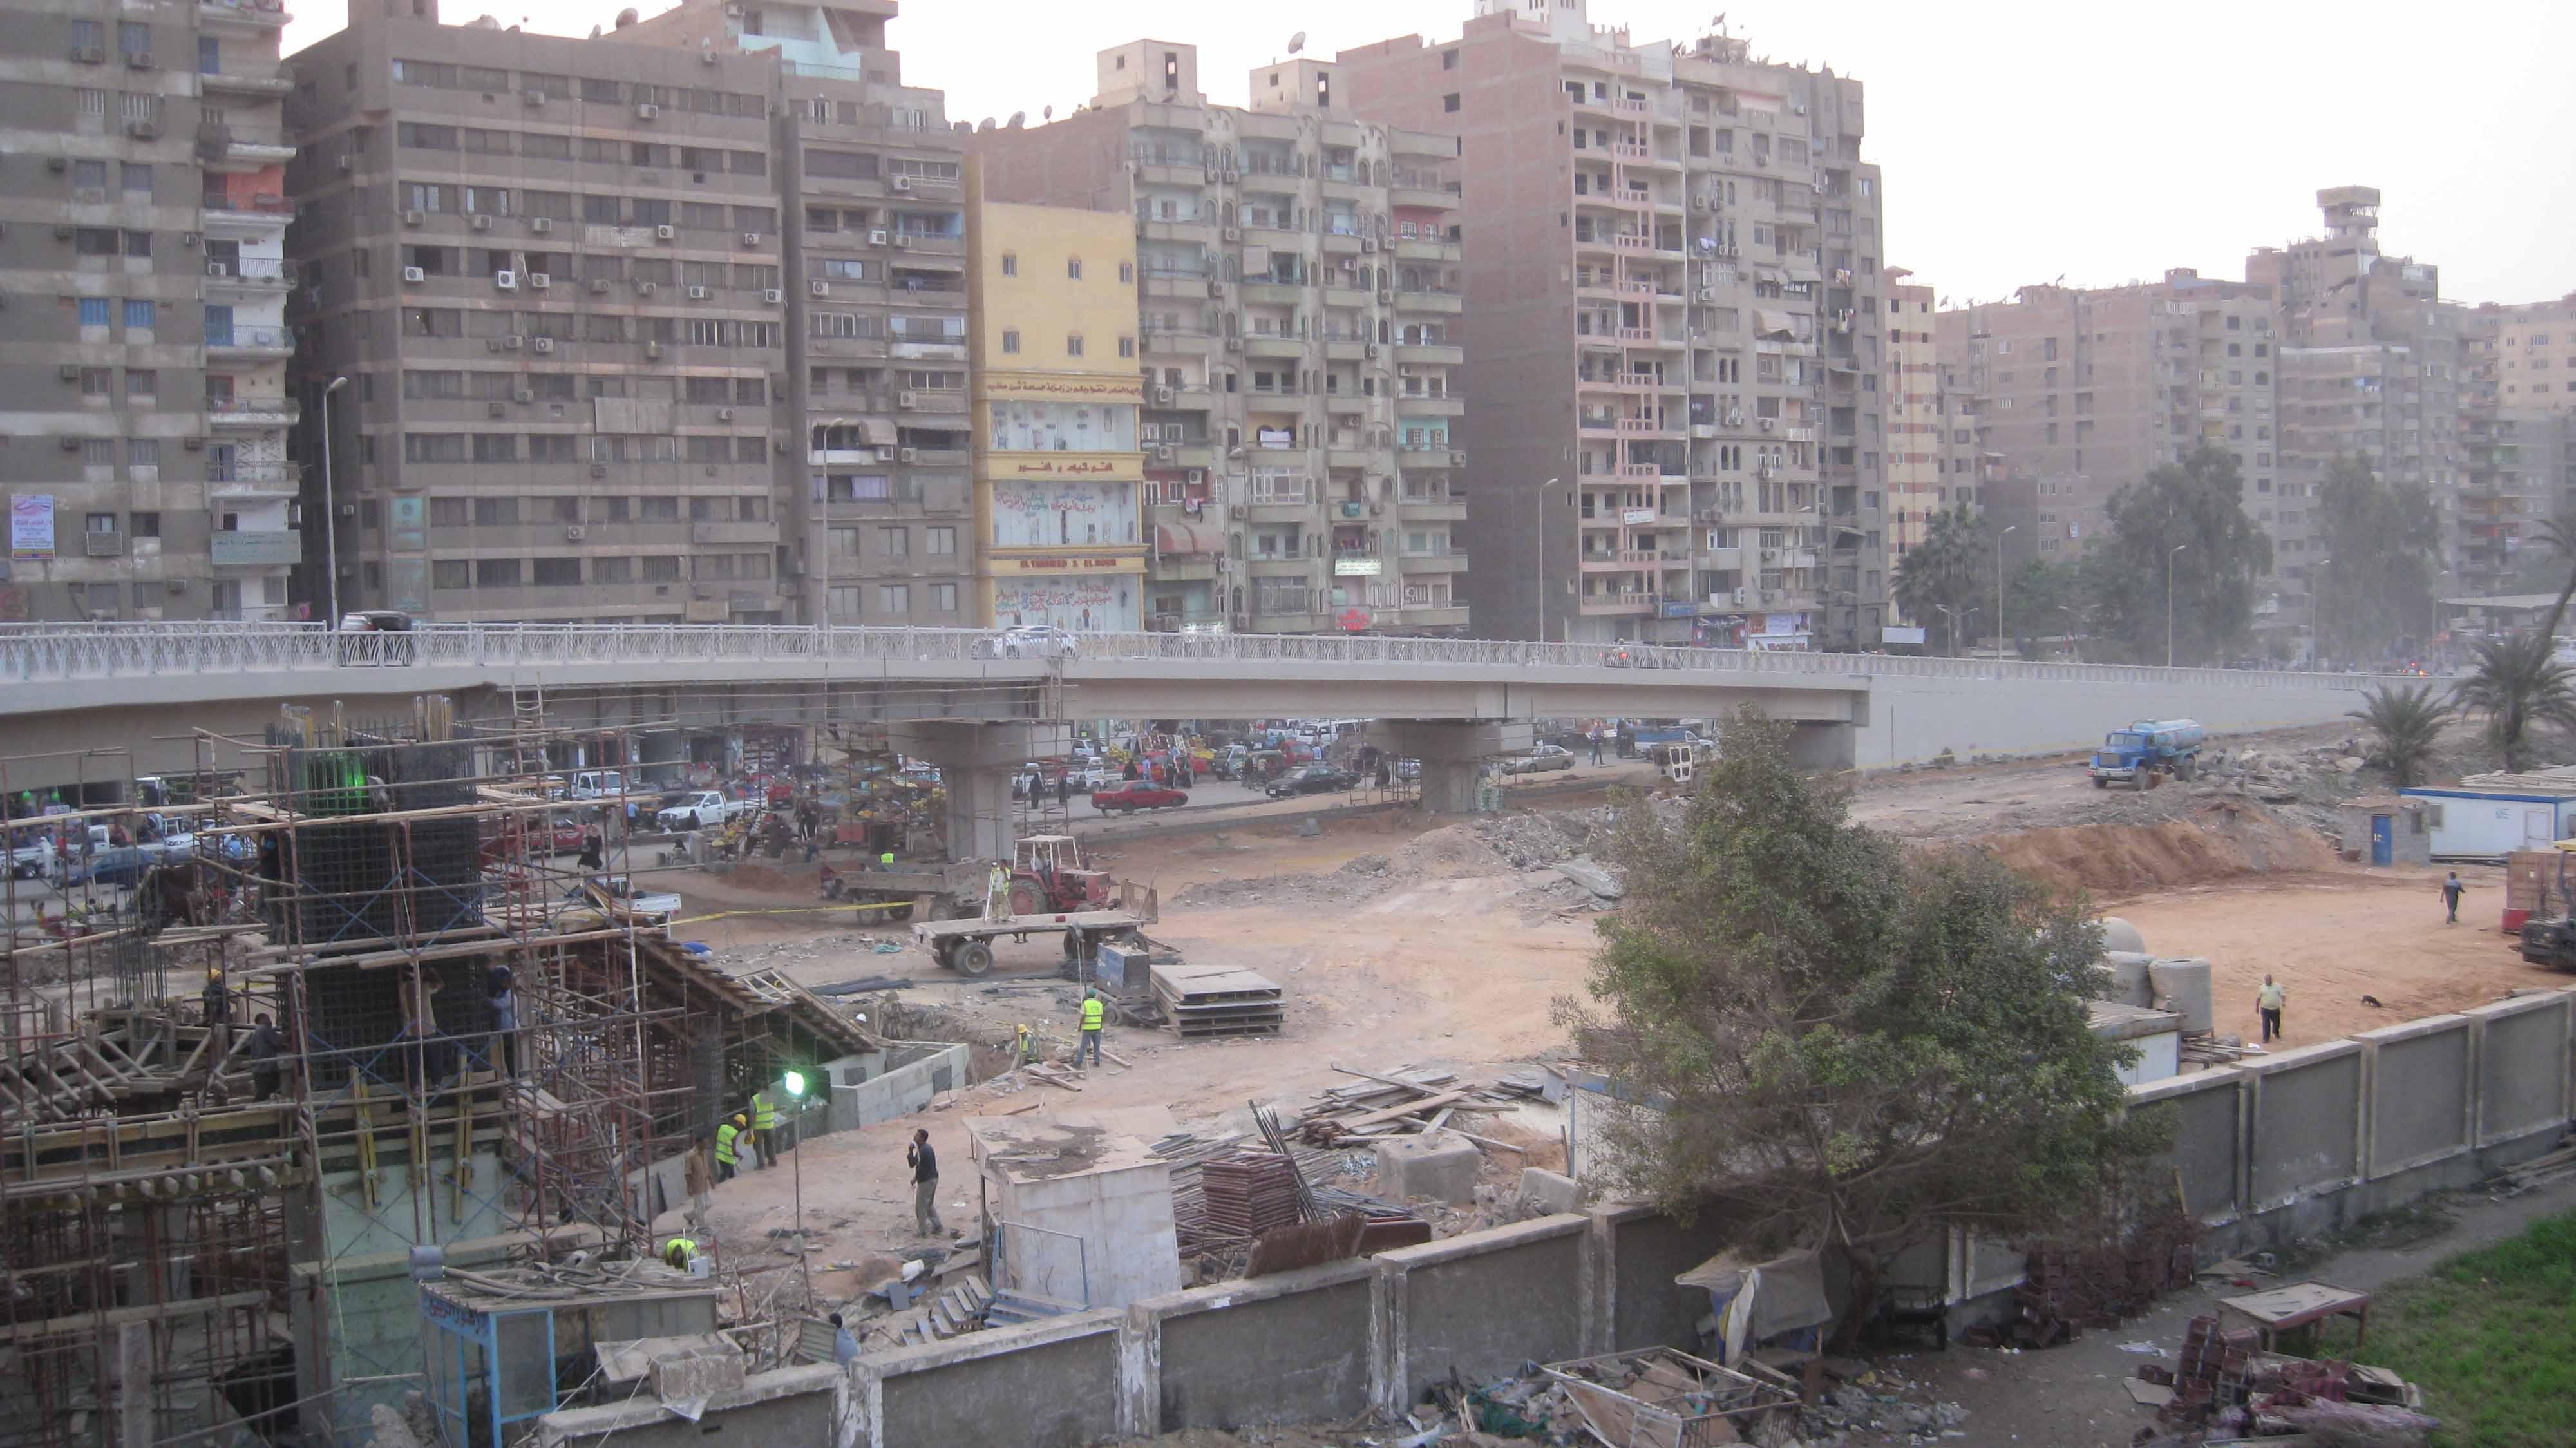 Ard Ellwaa Bridge (36)